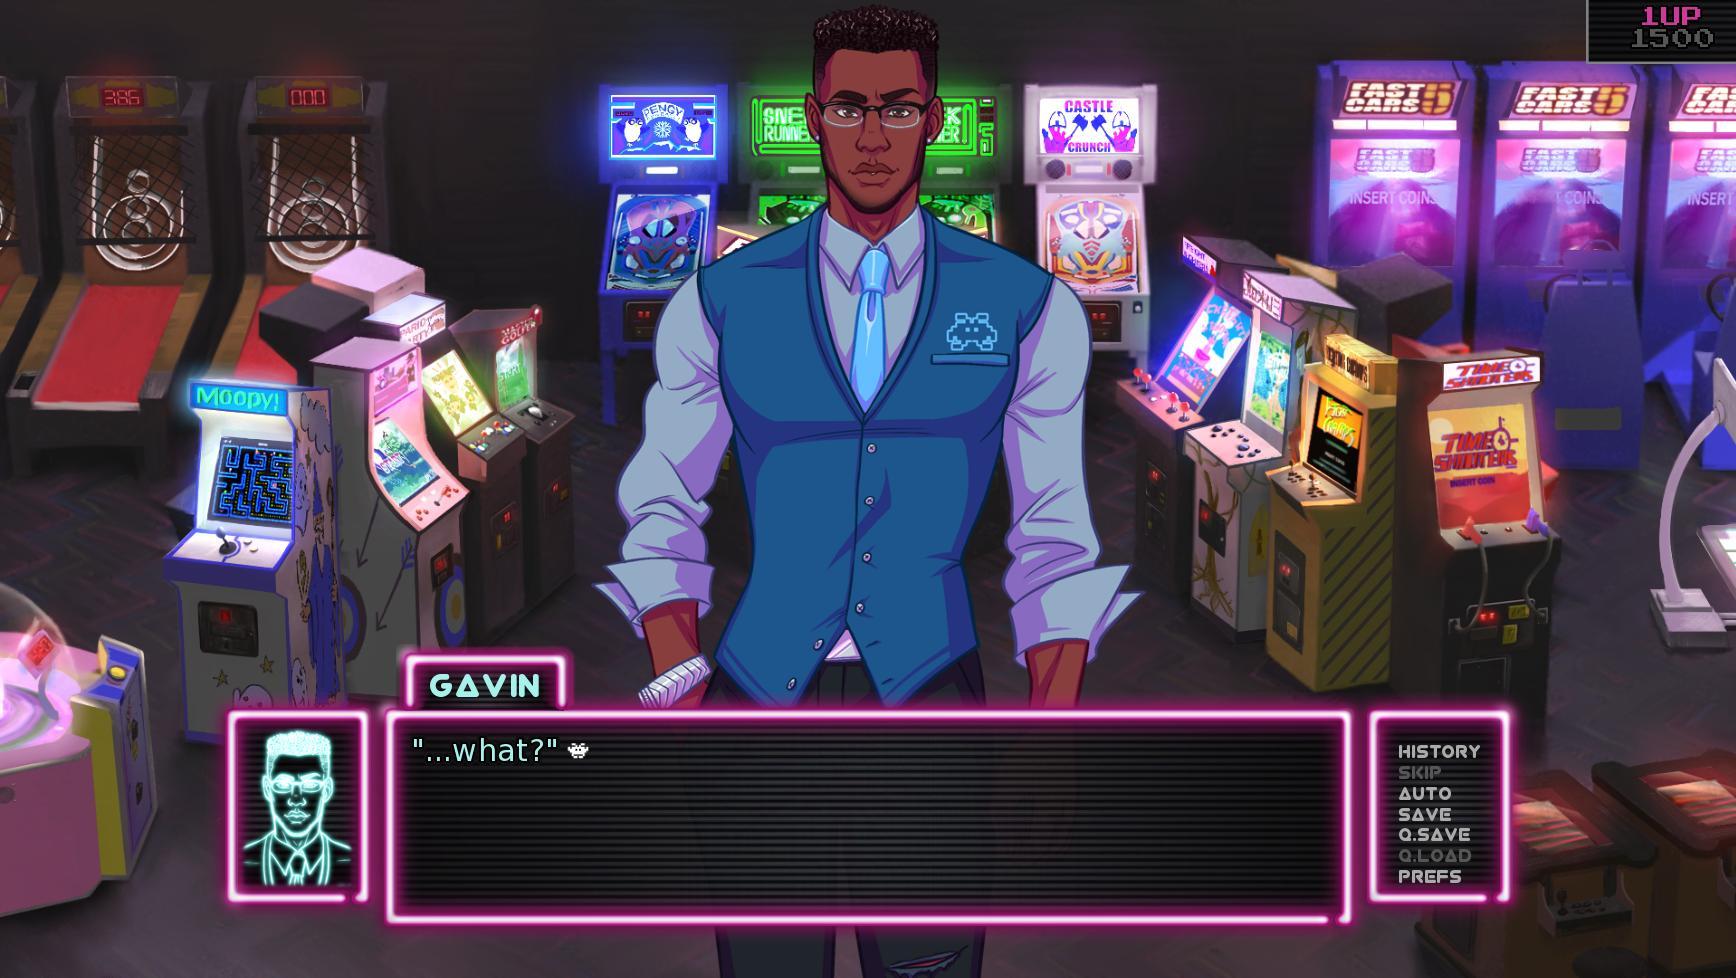 ArcadeSpirits 2019-02-02 01-25-48-08.jpg